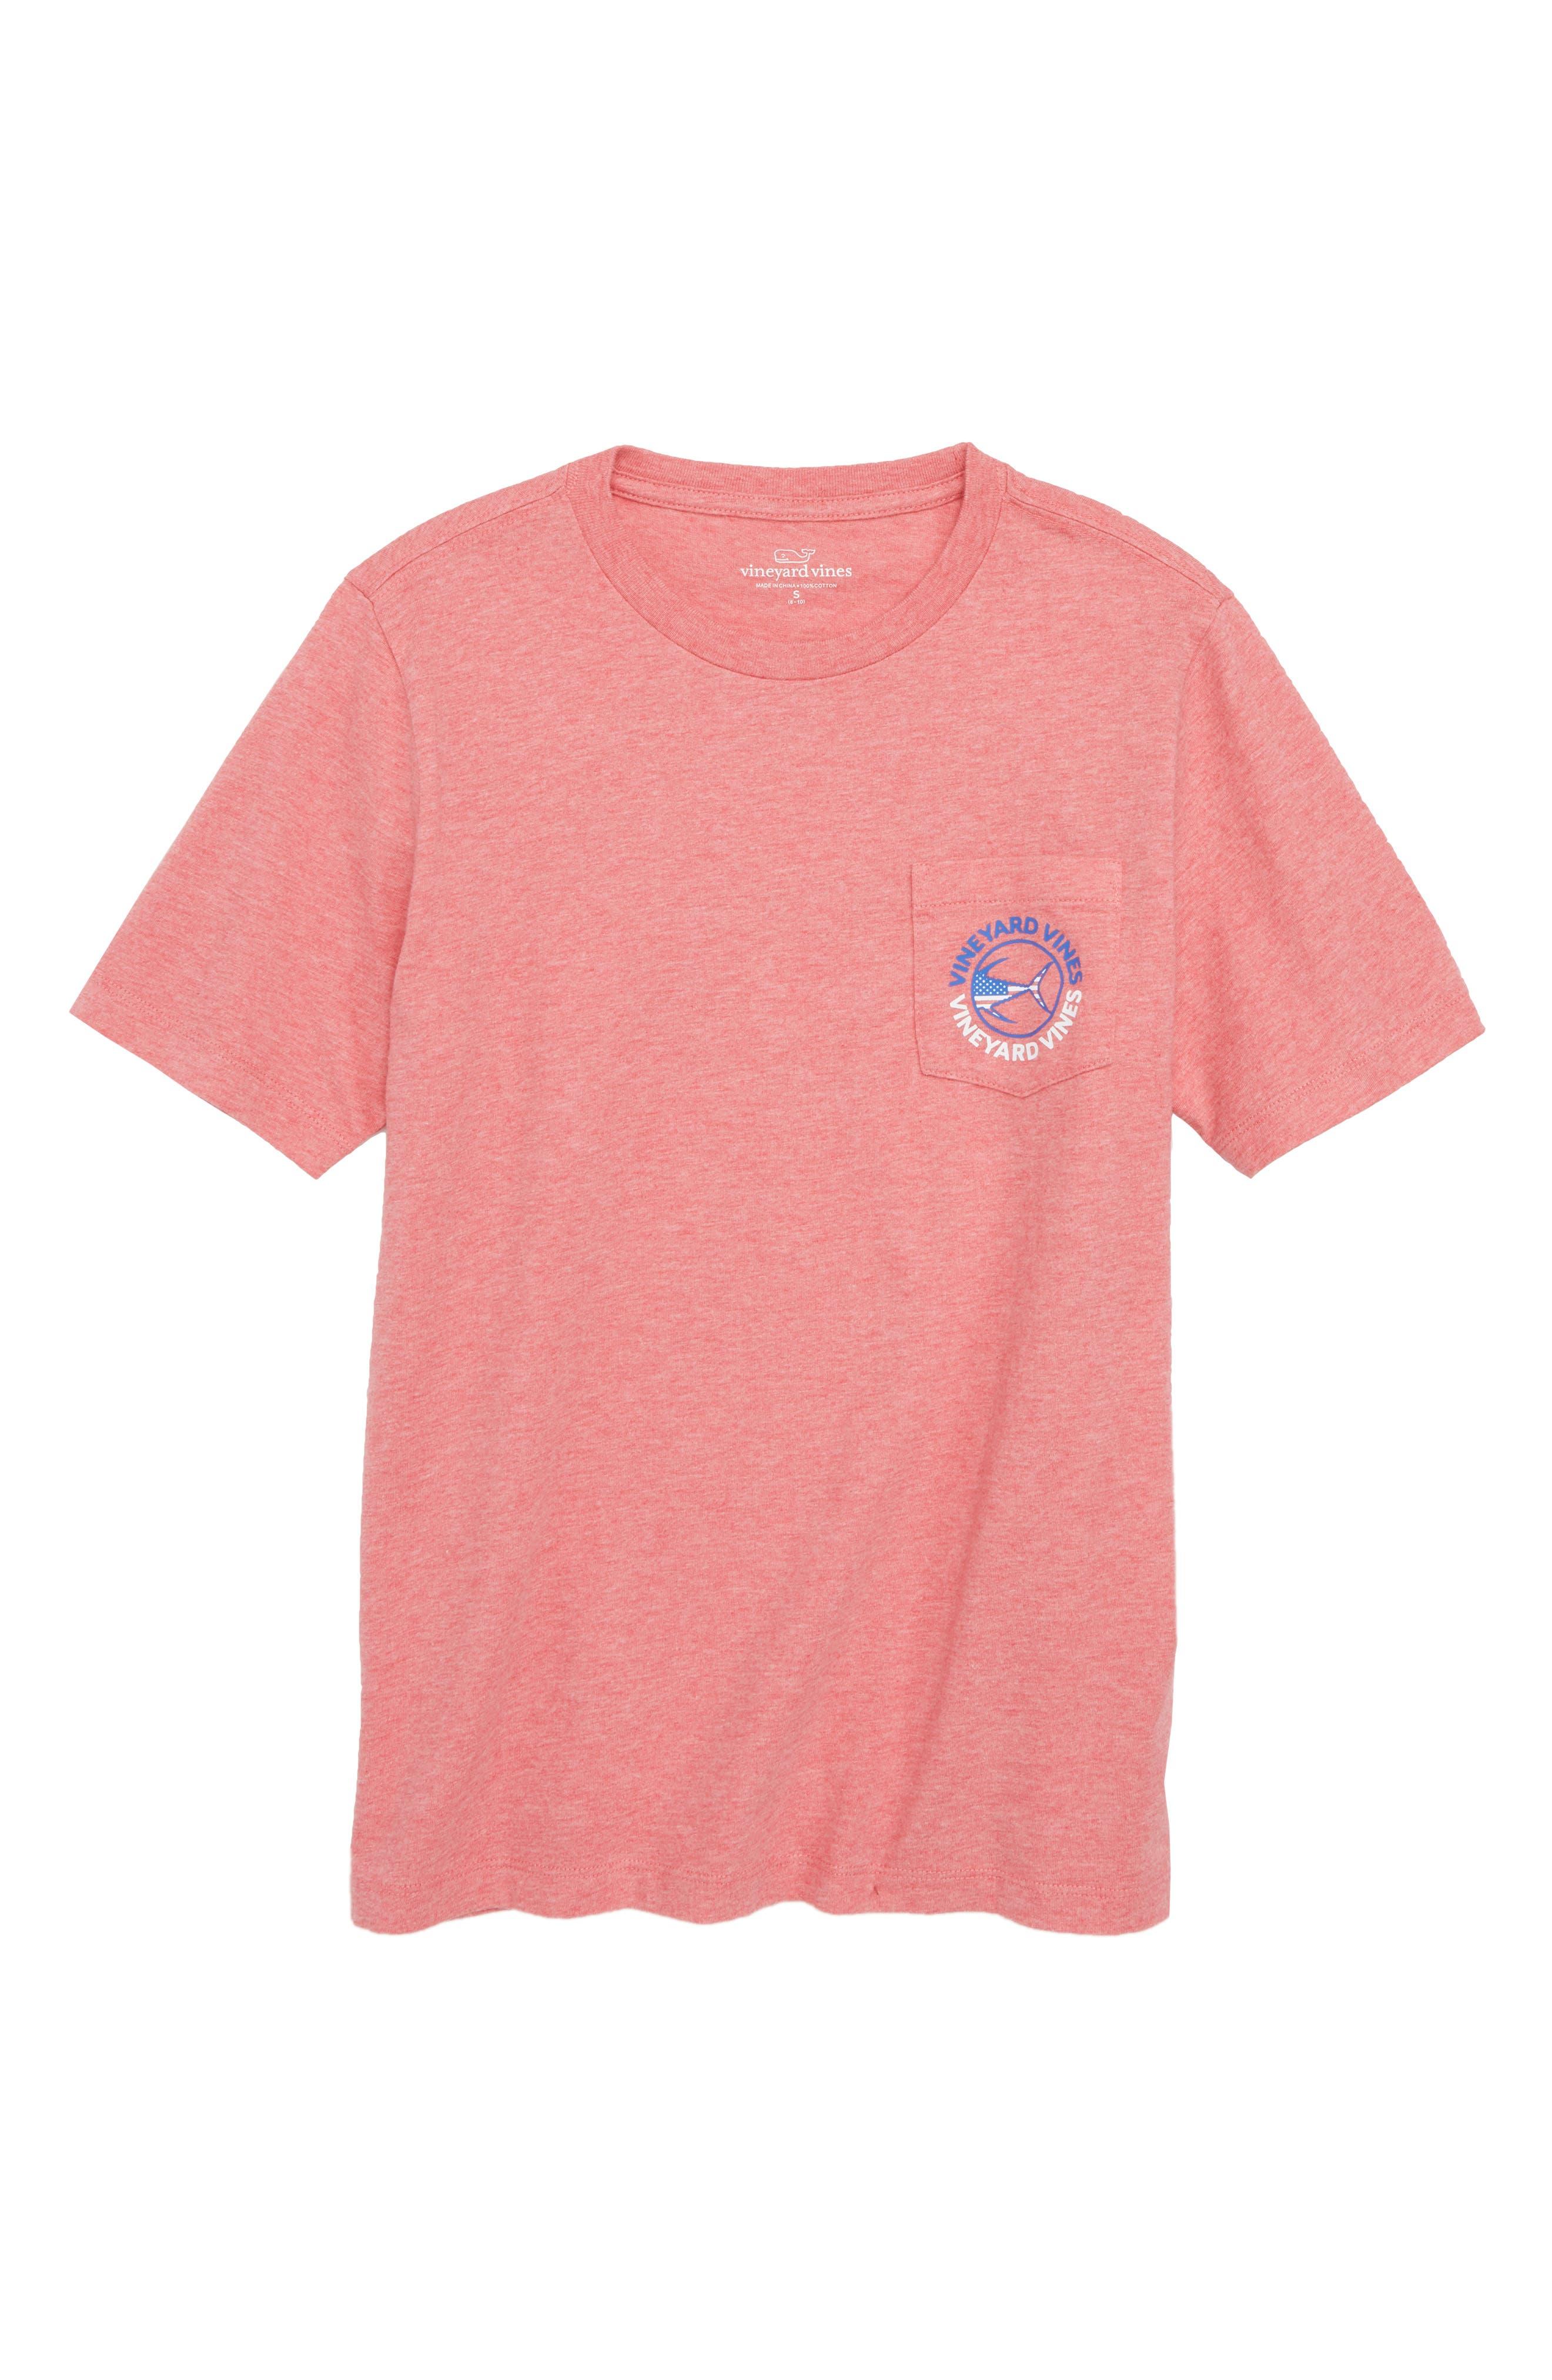 vineyard vines Tuna USA Pocket T-Shirt (Toddler Boys & Little Boys)